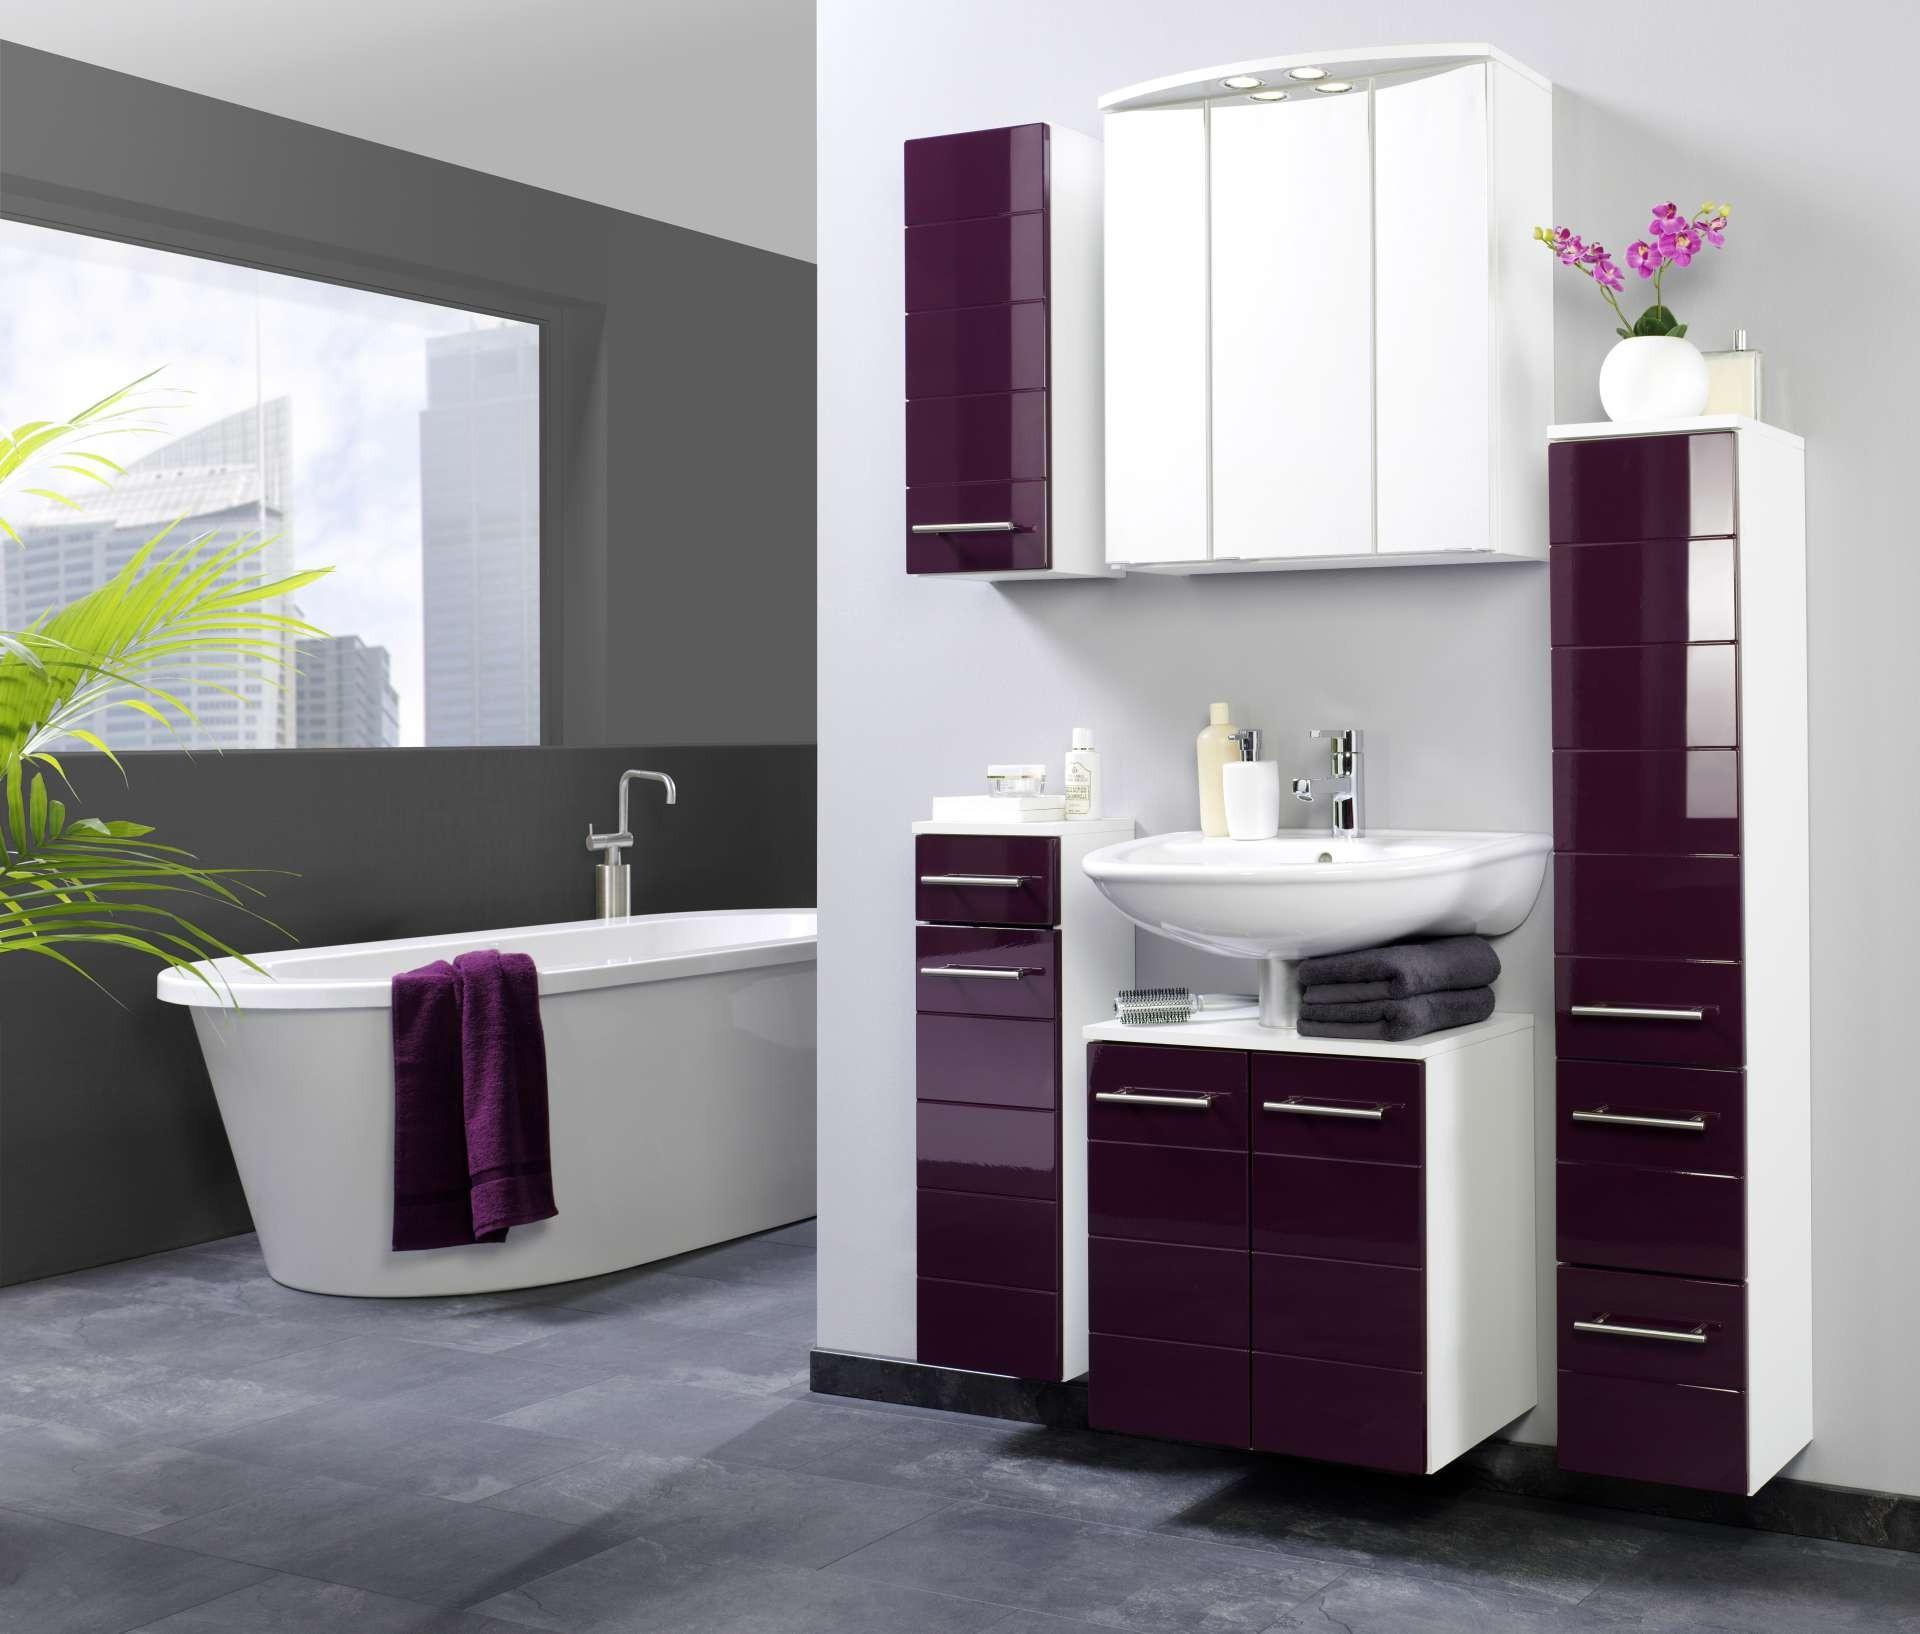 bad midischrank rimini 1 t rig 2 schublade 25 cm breit hochglanz aubergine bad bad. Black Bedroom Furniture Sets. Home Design Ideas